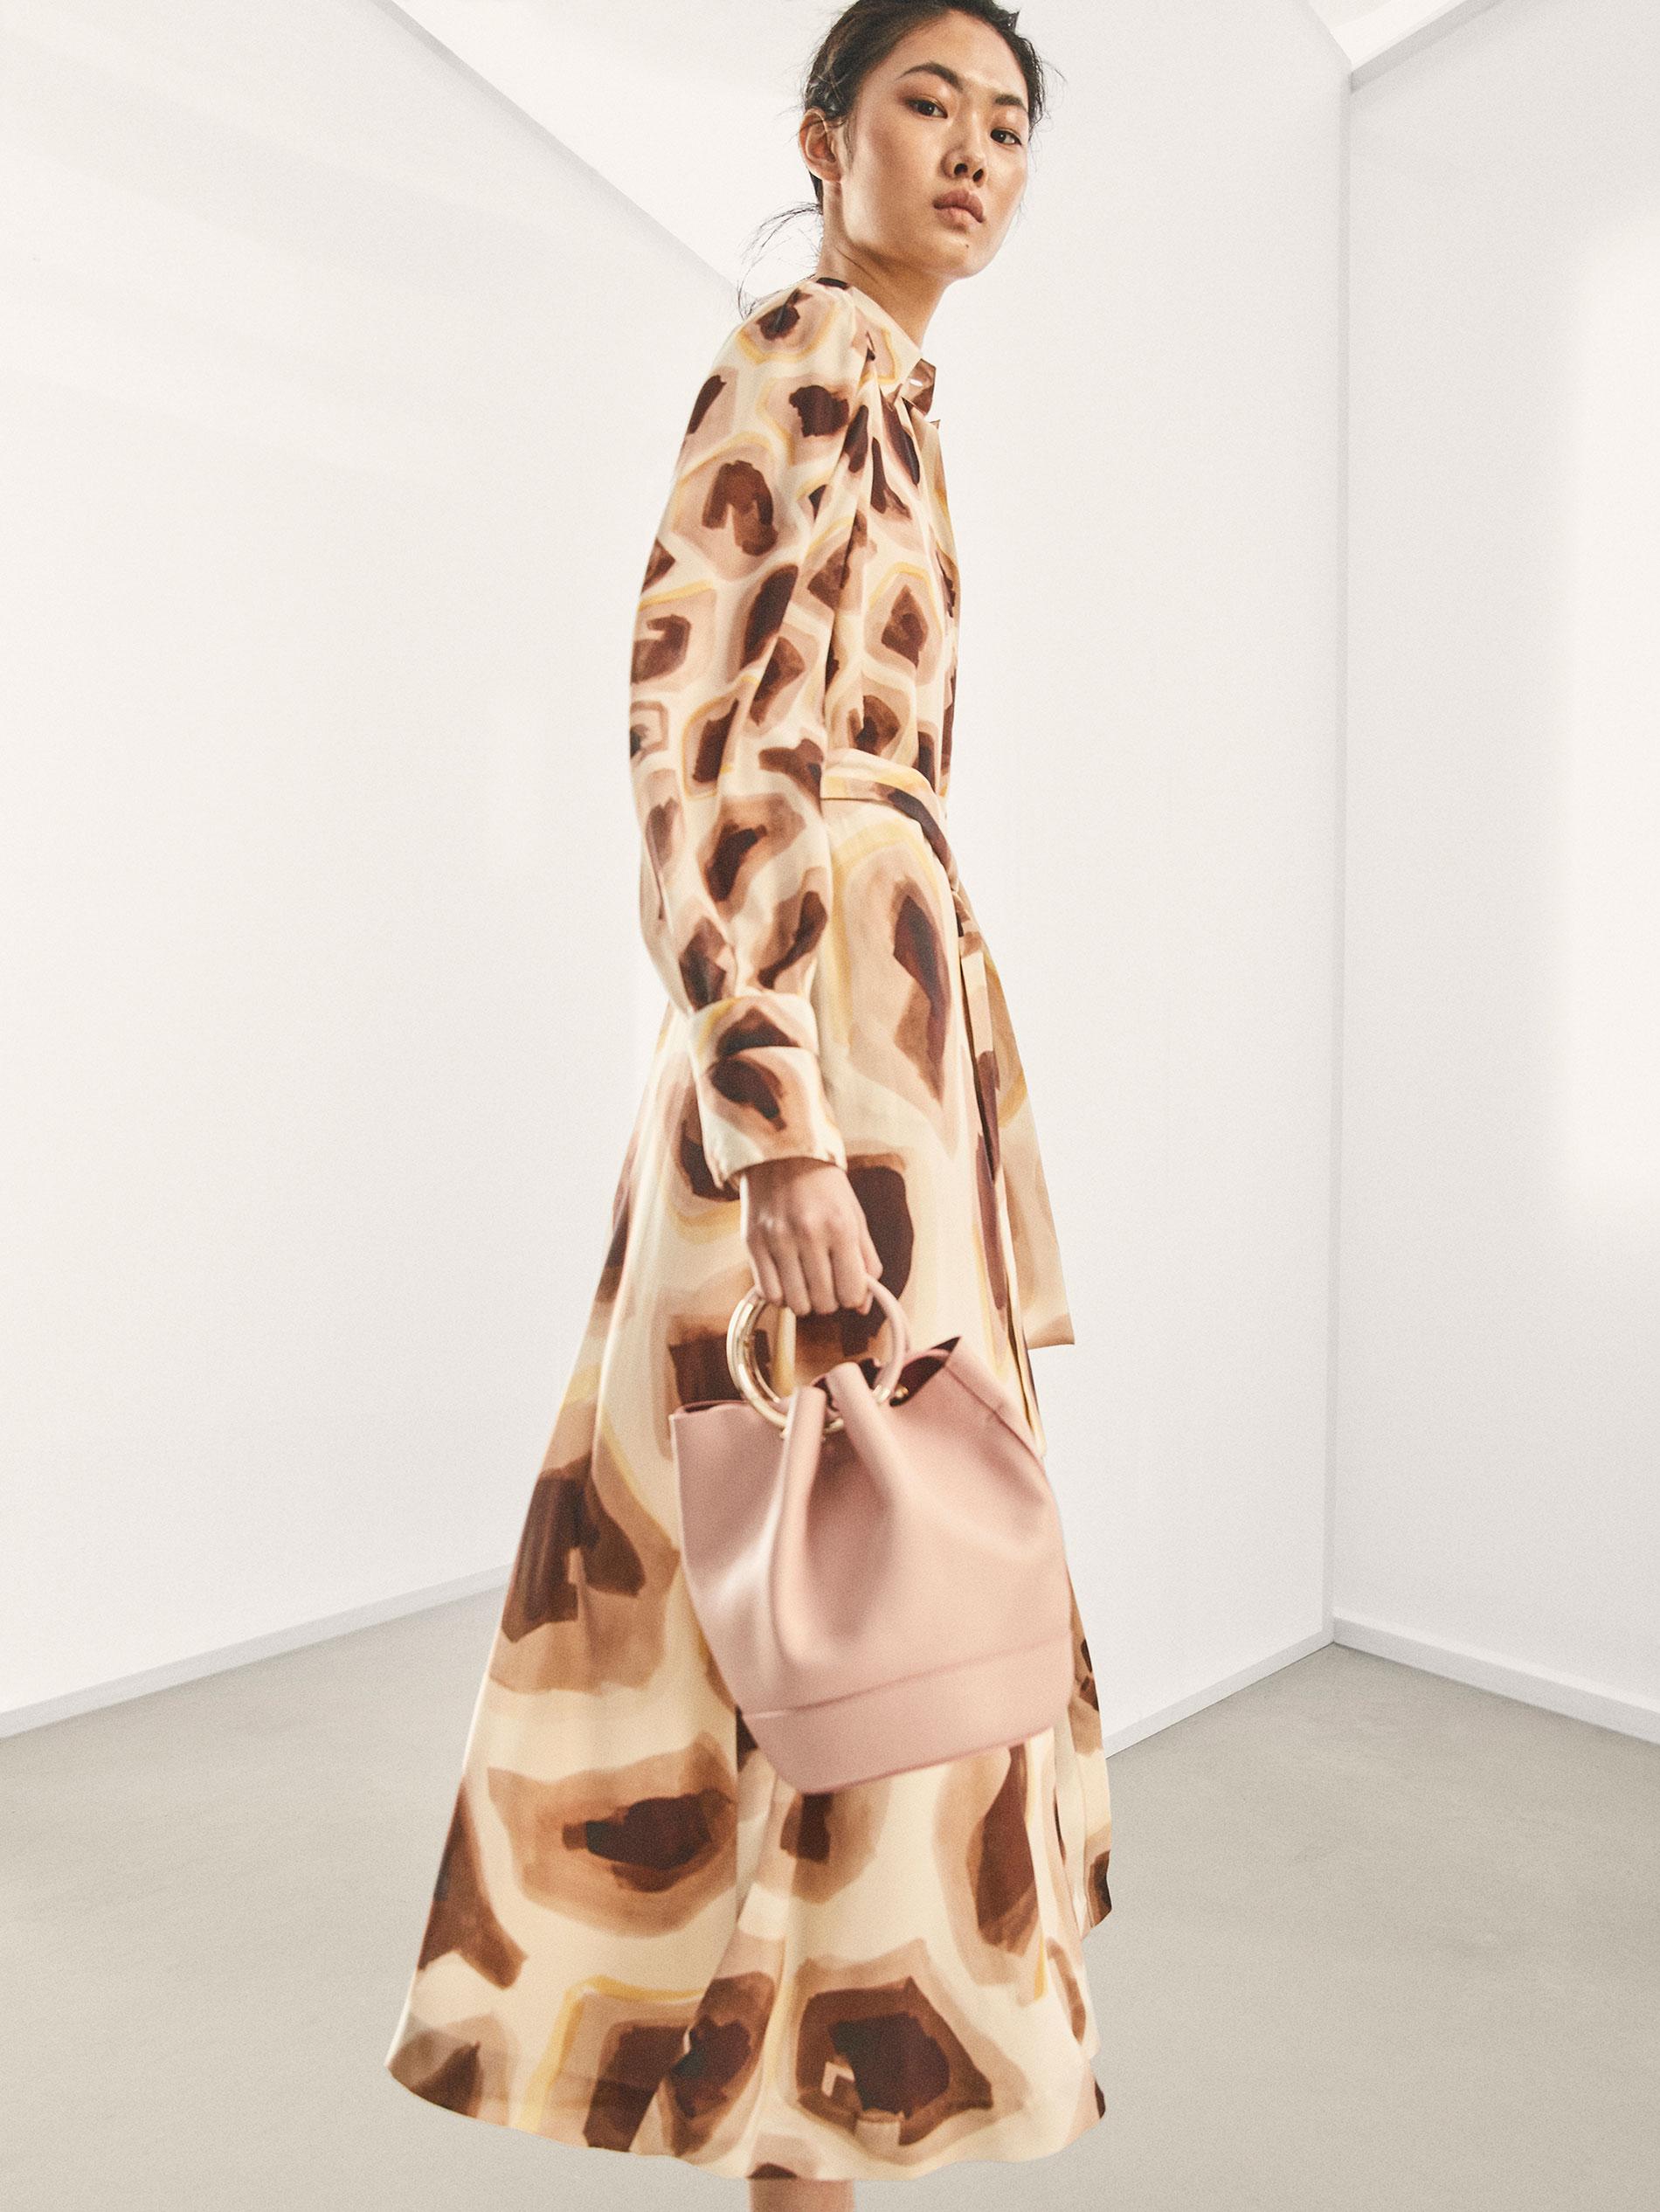 5a72b9abd9 Massimo Dutti LIMITED EDITION GIRAFFE PRINT SILK DRESS at £229 ...